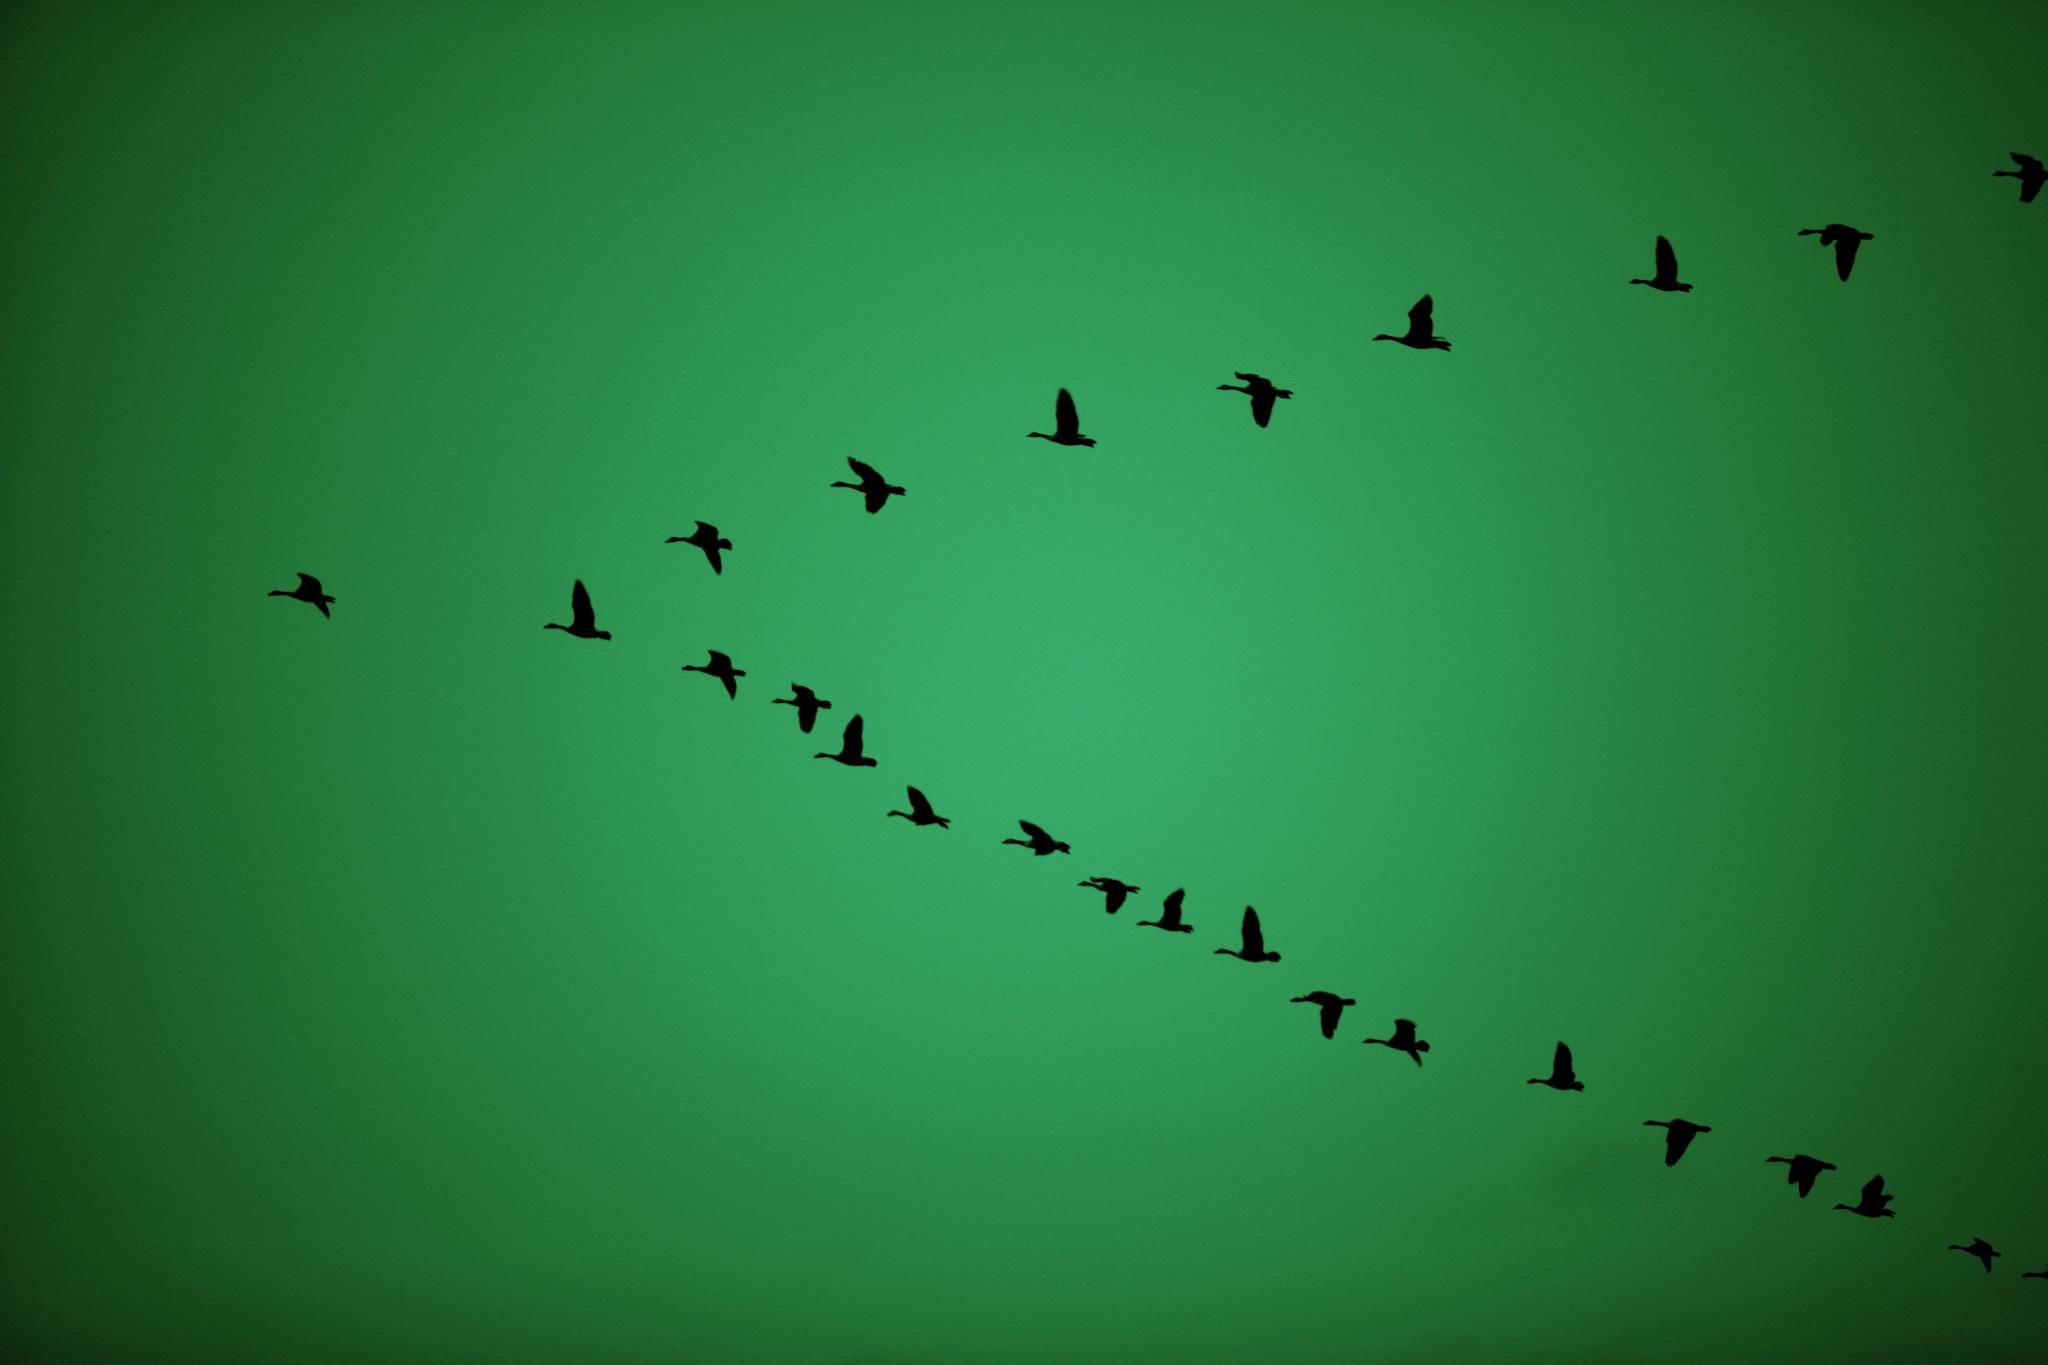 bird-birds-geese-1272966-o.jpg